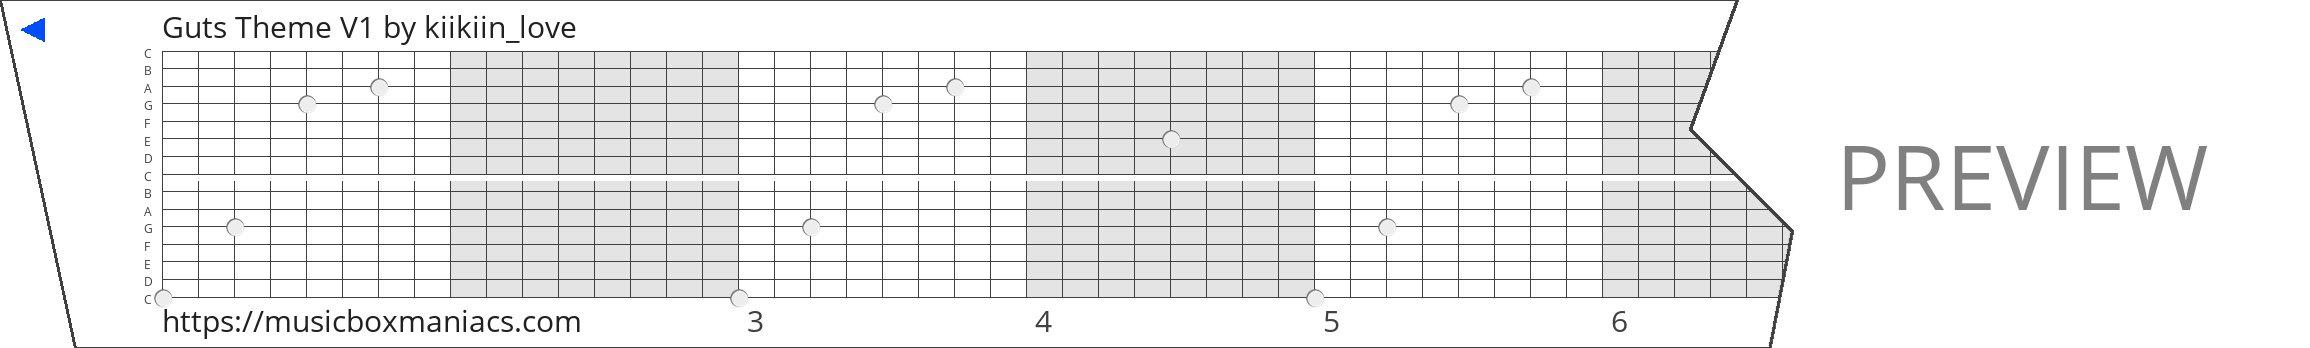 Guts Theme V1 15 note music box paper strip